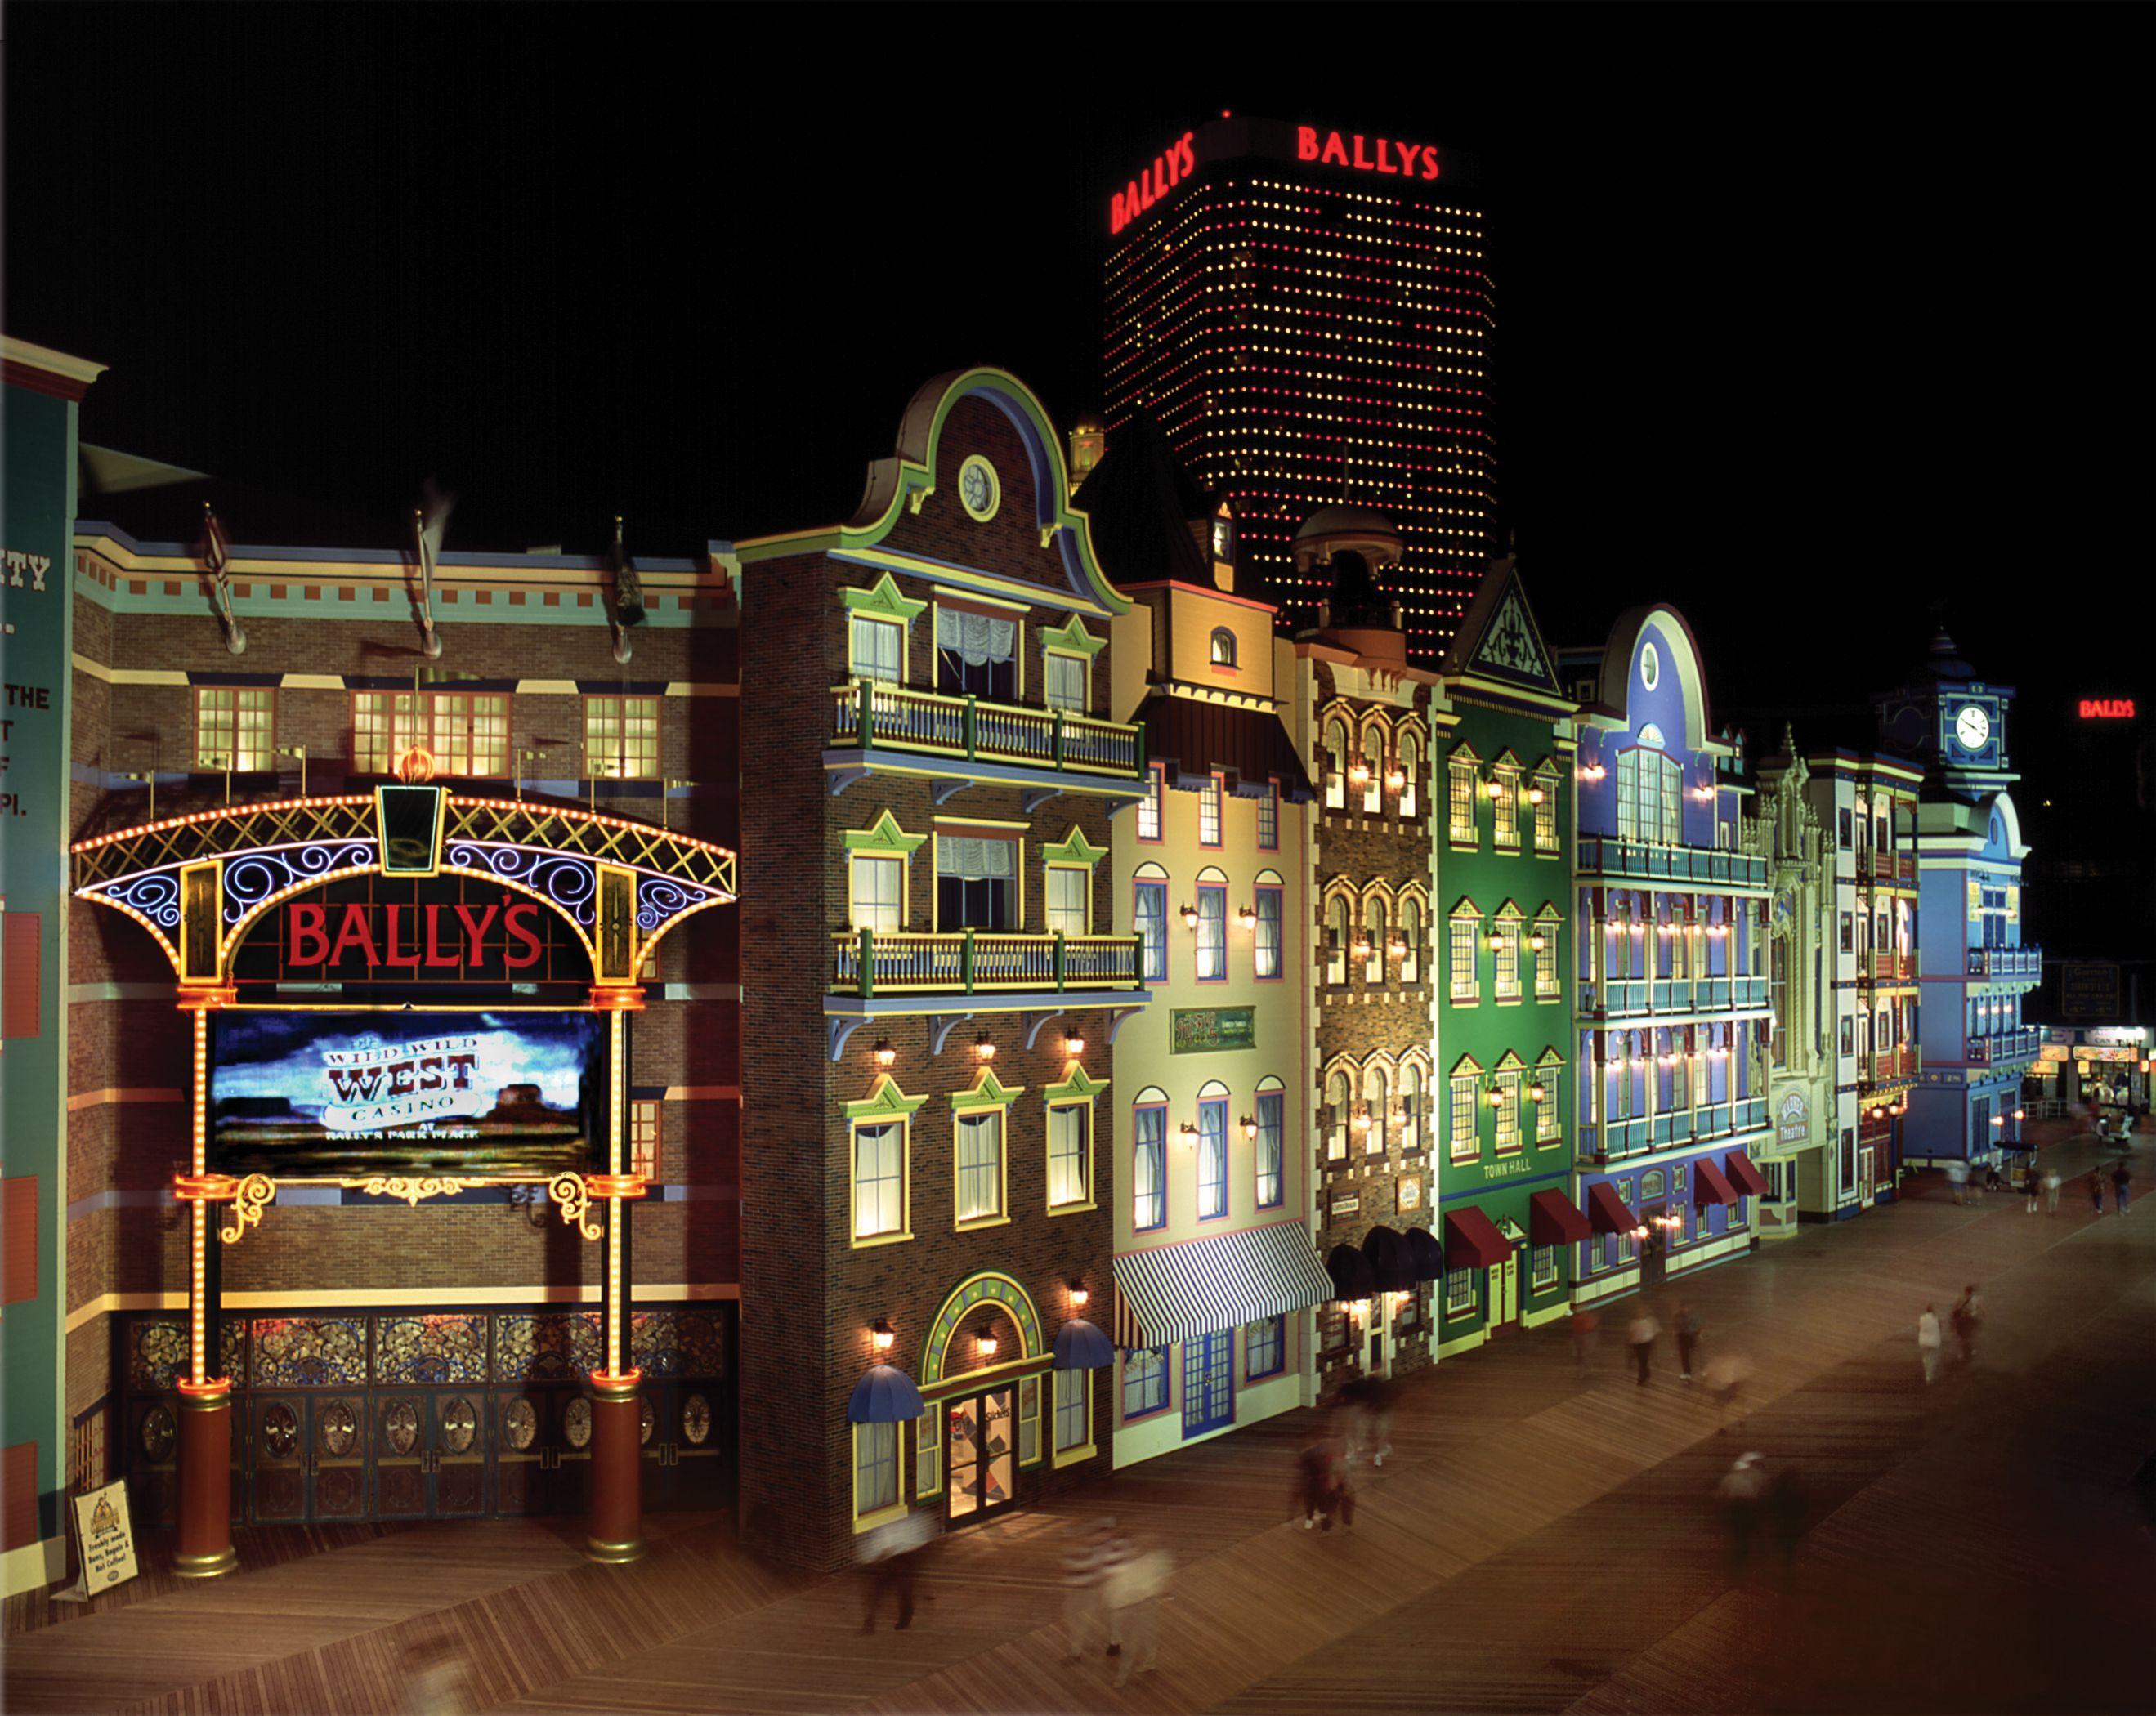 Atlantic City Boardwalk Atlantic City Hotels Atlantic City Boardwalk Atlantic City Restaurants